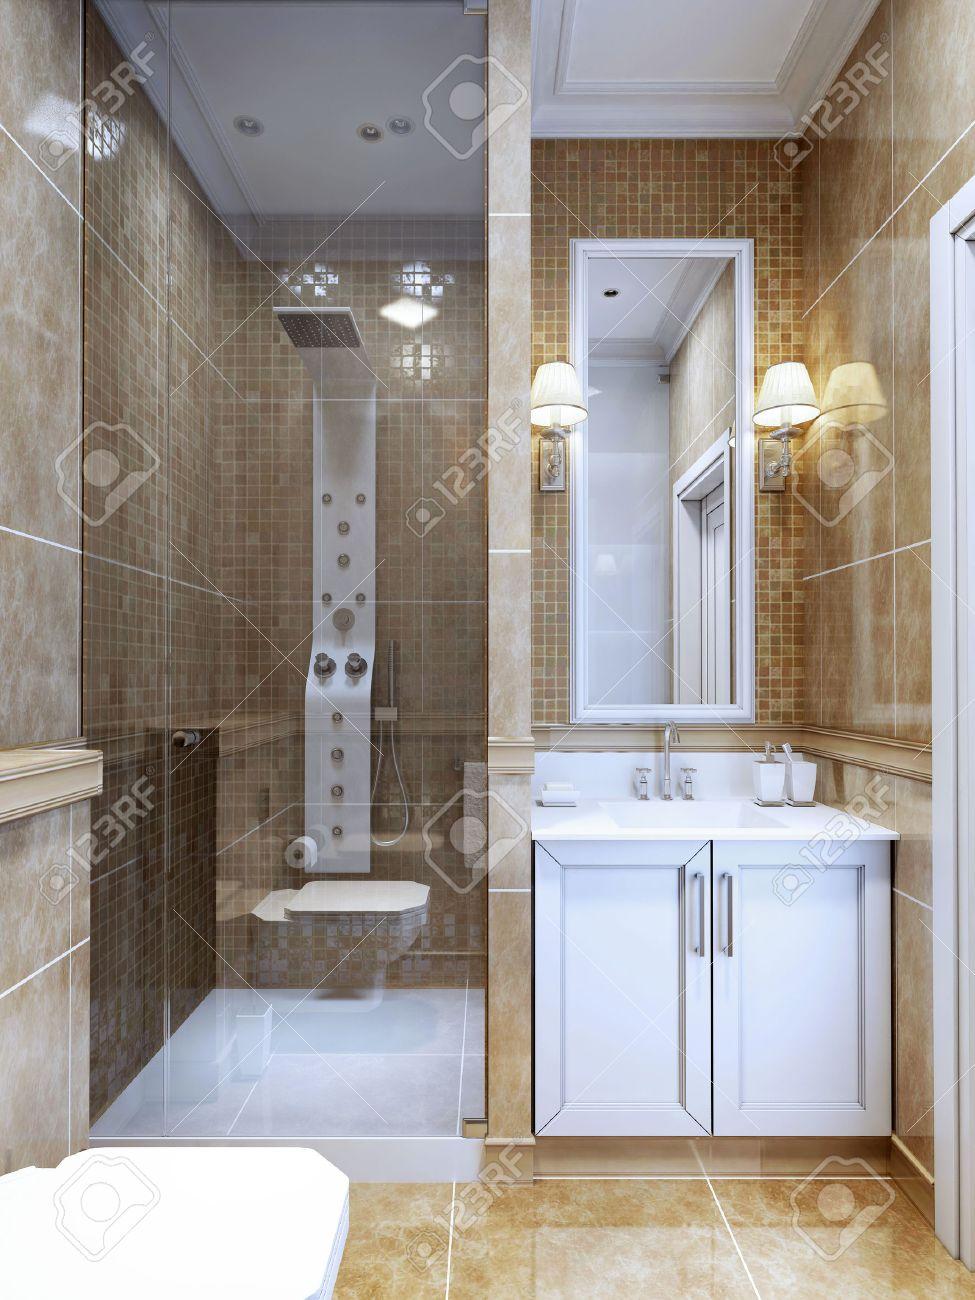 bagni mosaico moderni. piastrelle mosaico per bagni vovellcom ... - Bagni Moderni Mattonelle